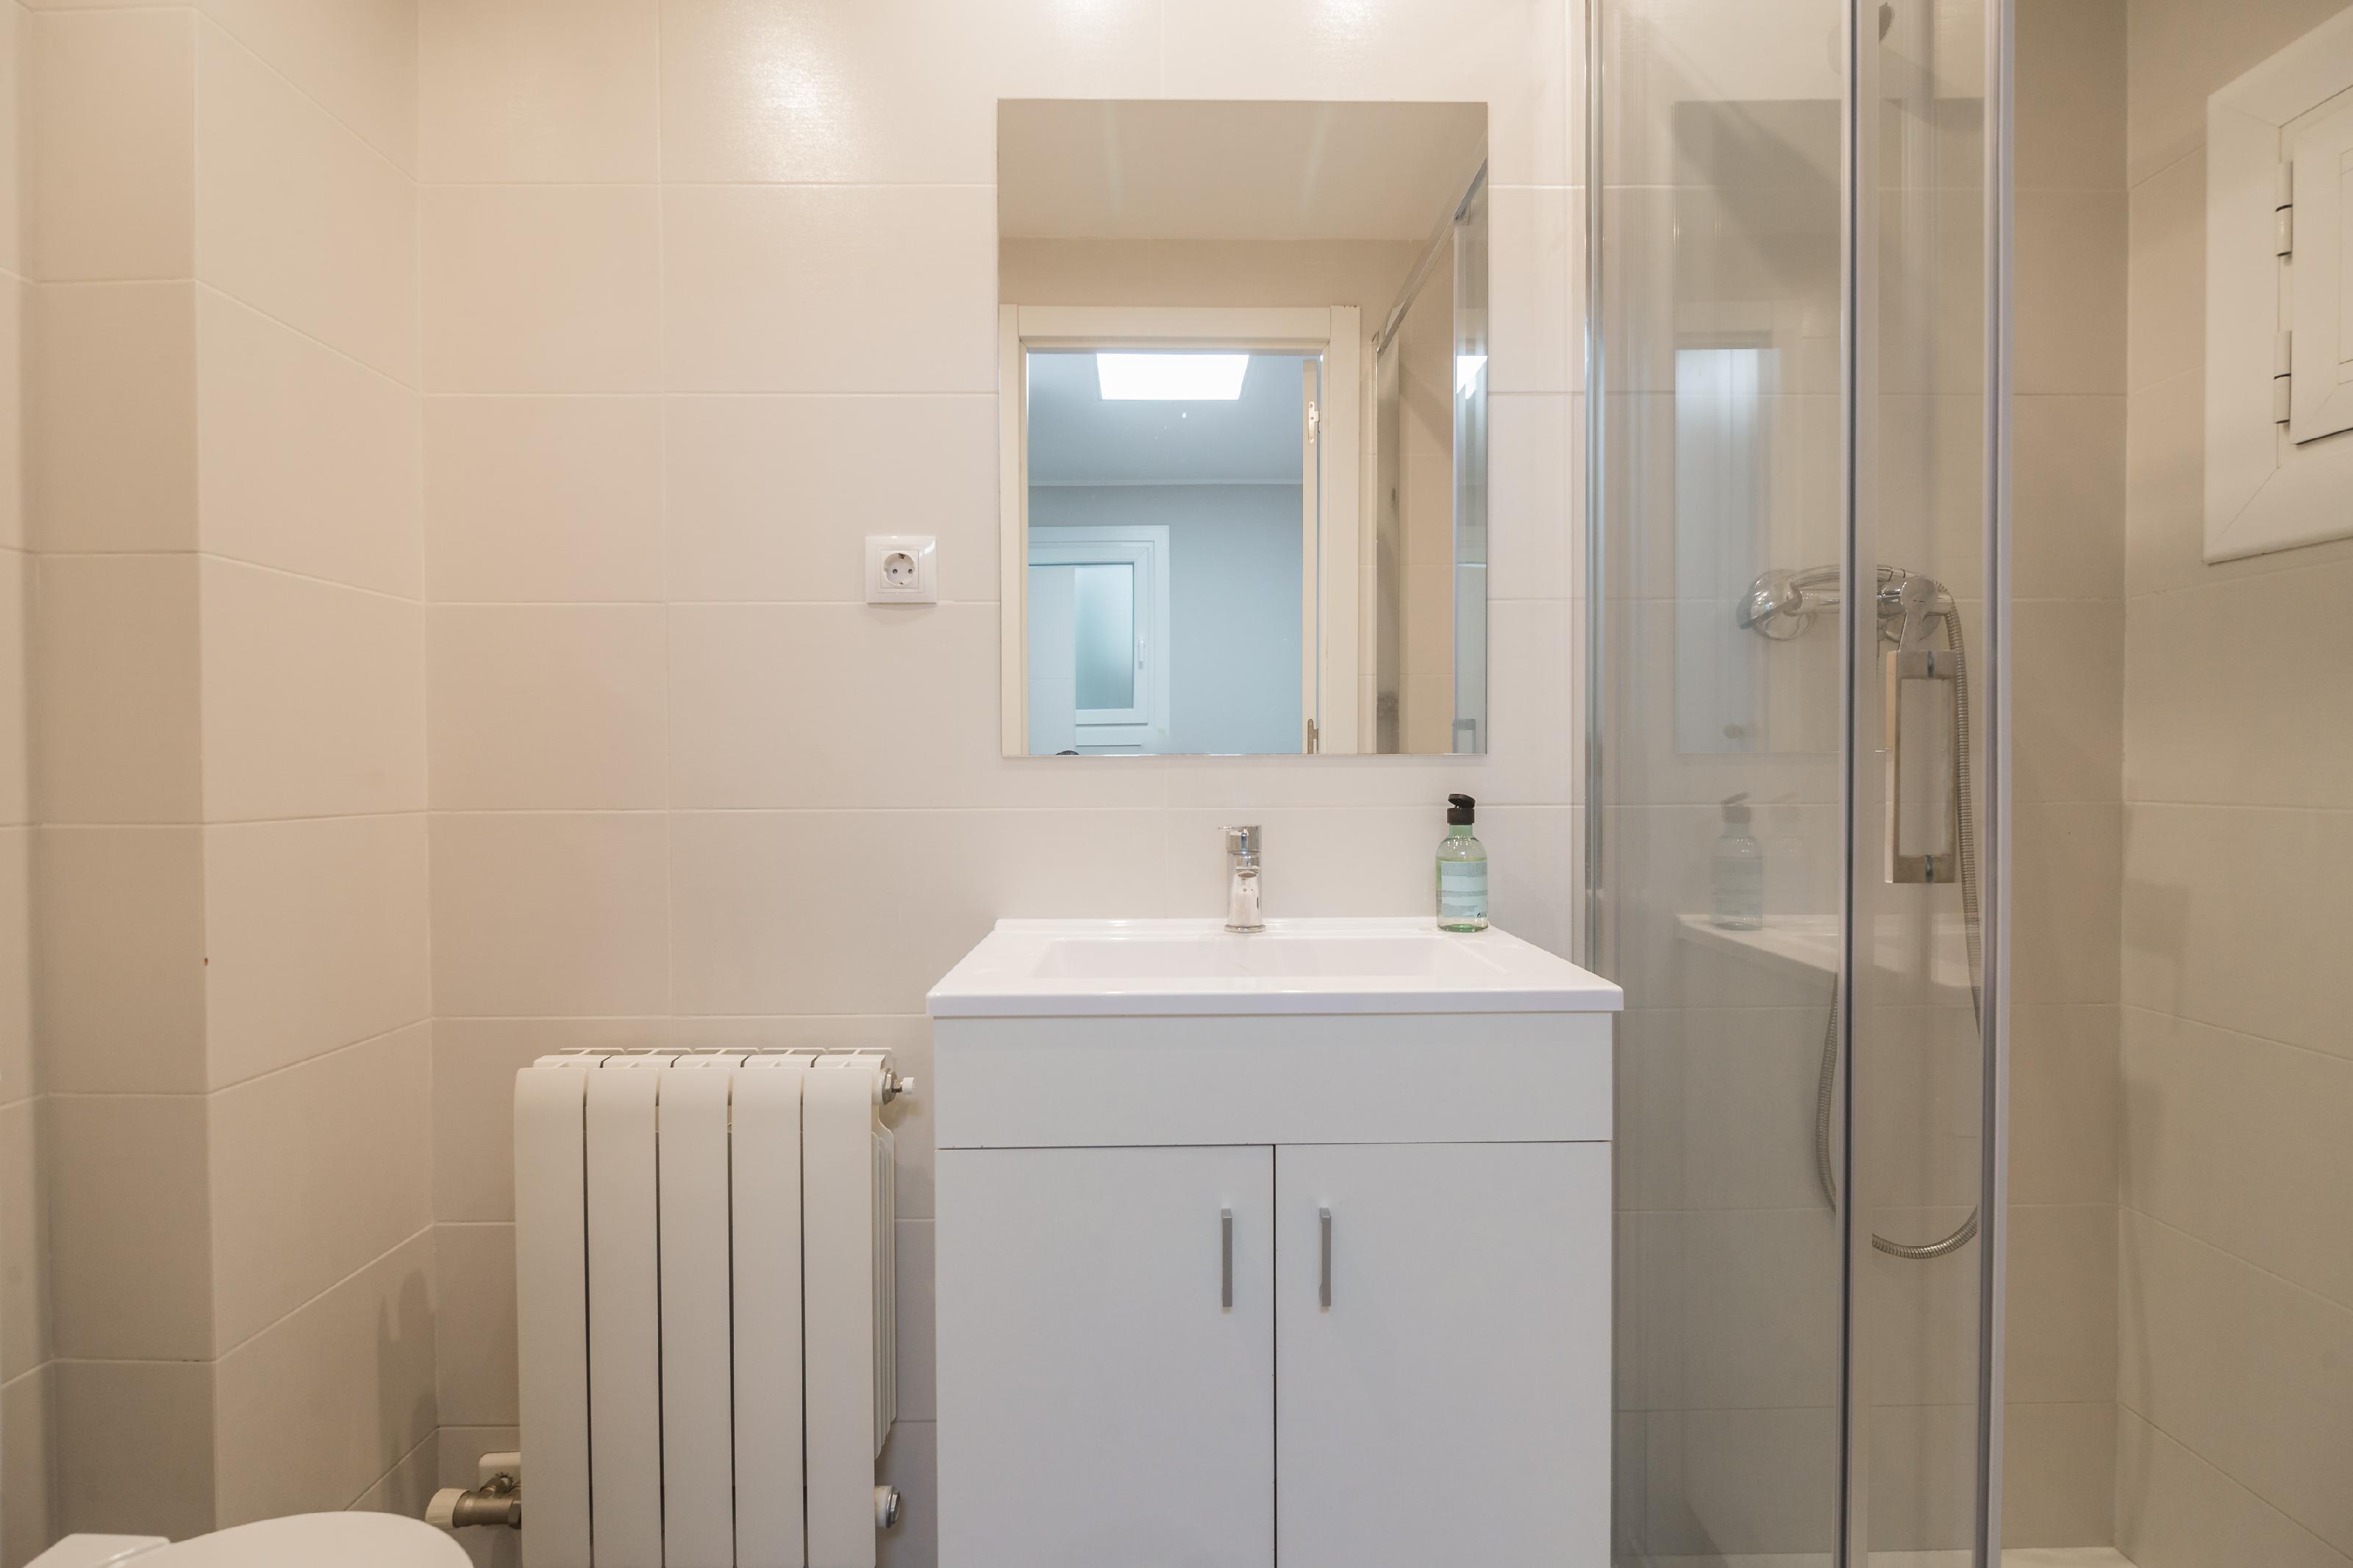 244392 Flat for sale in Sarrià-Sant Gervasi, Sant Gervasi-Galvany 30